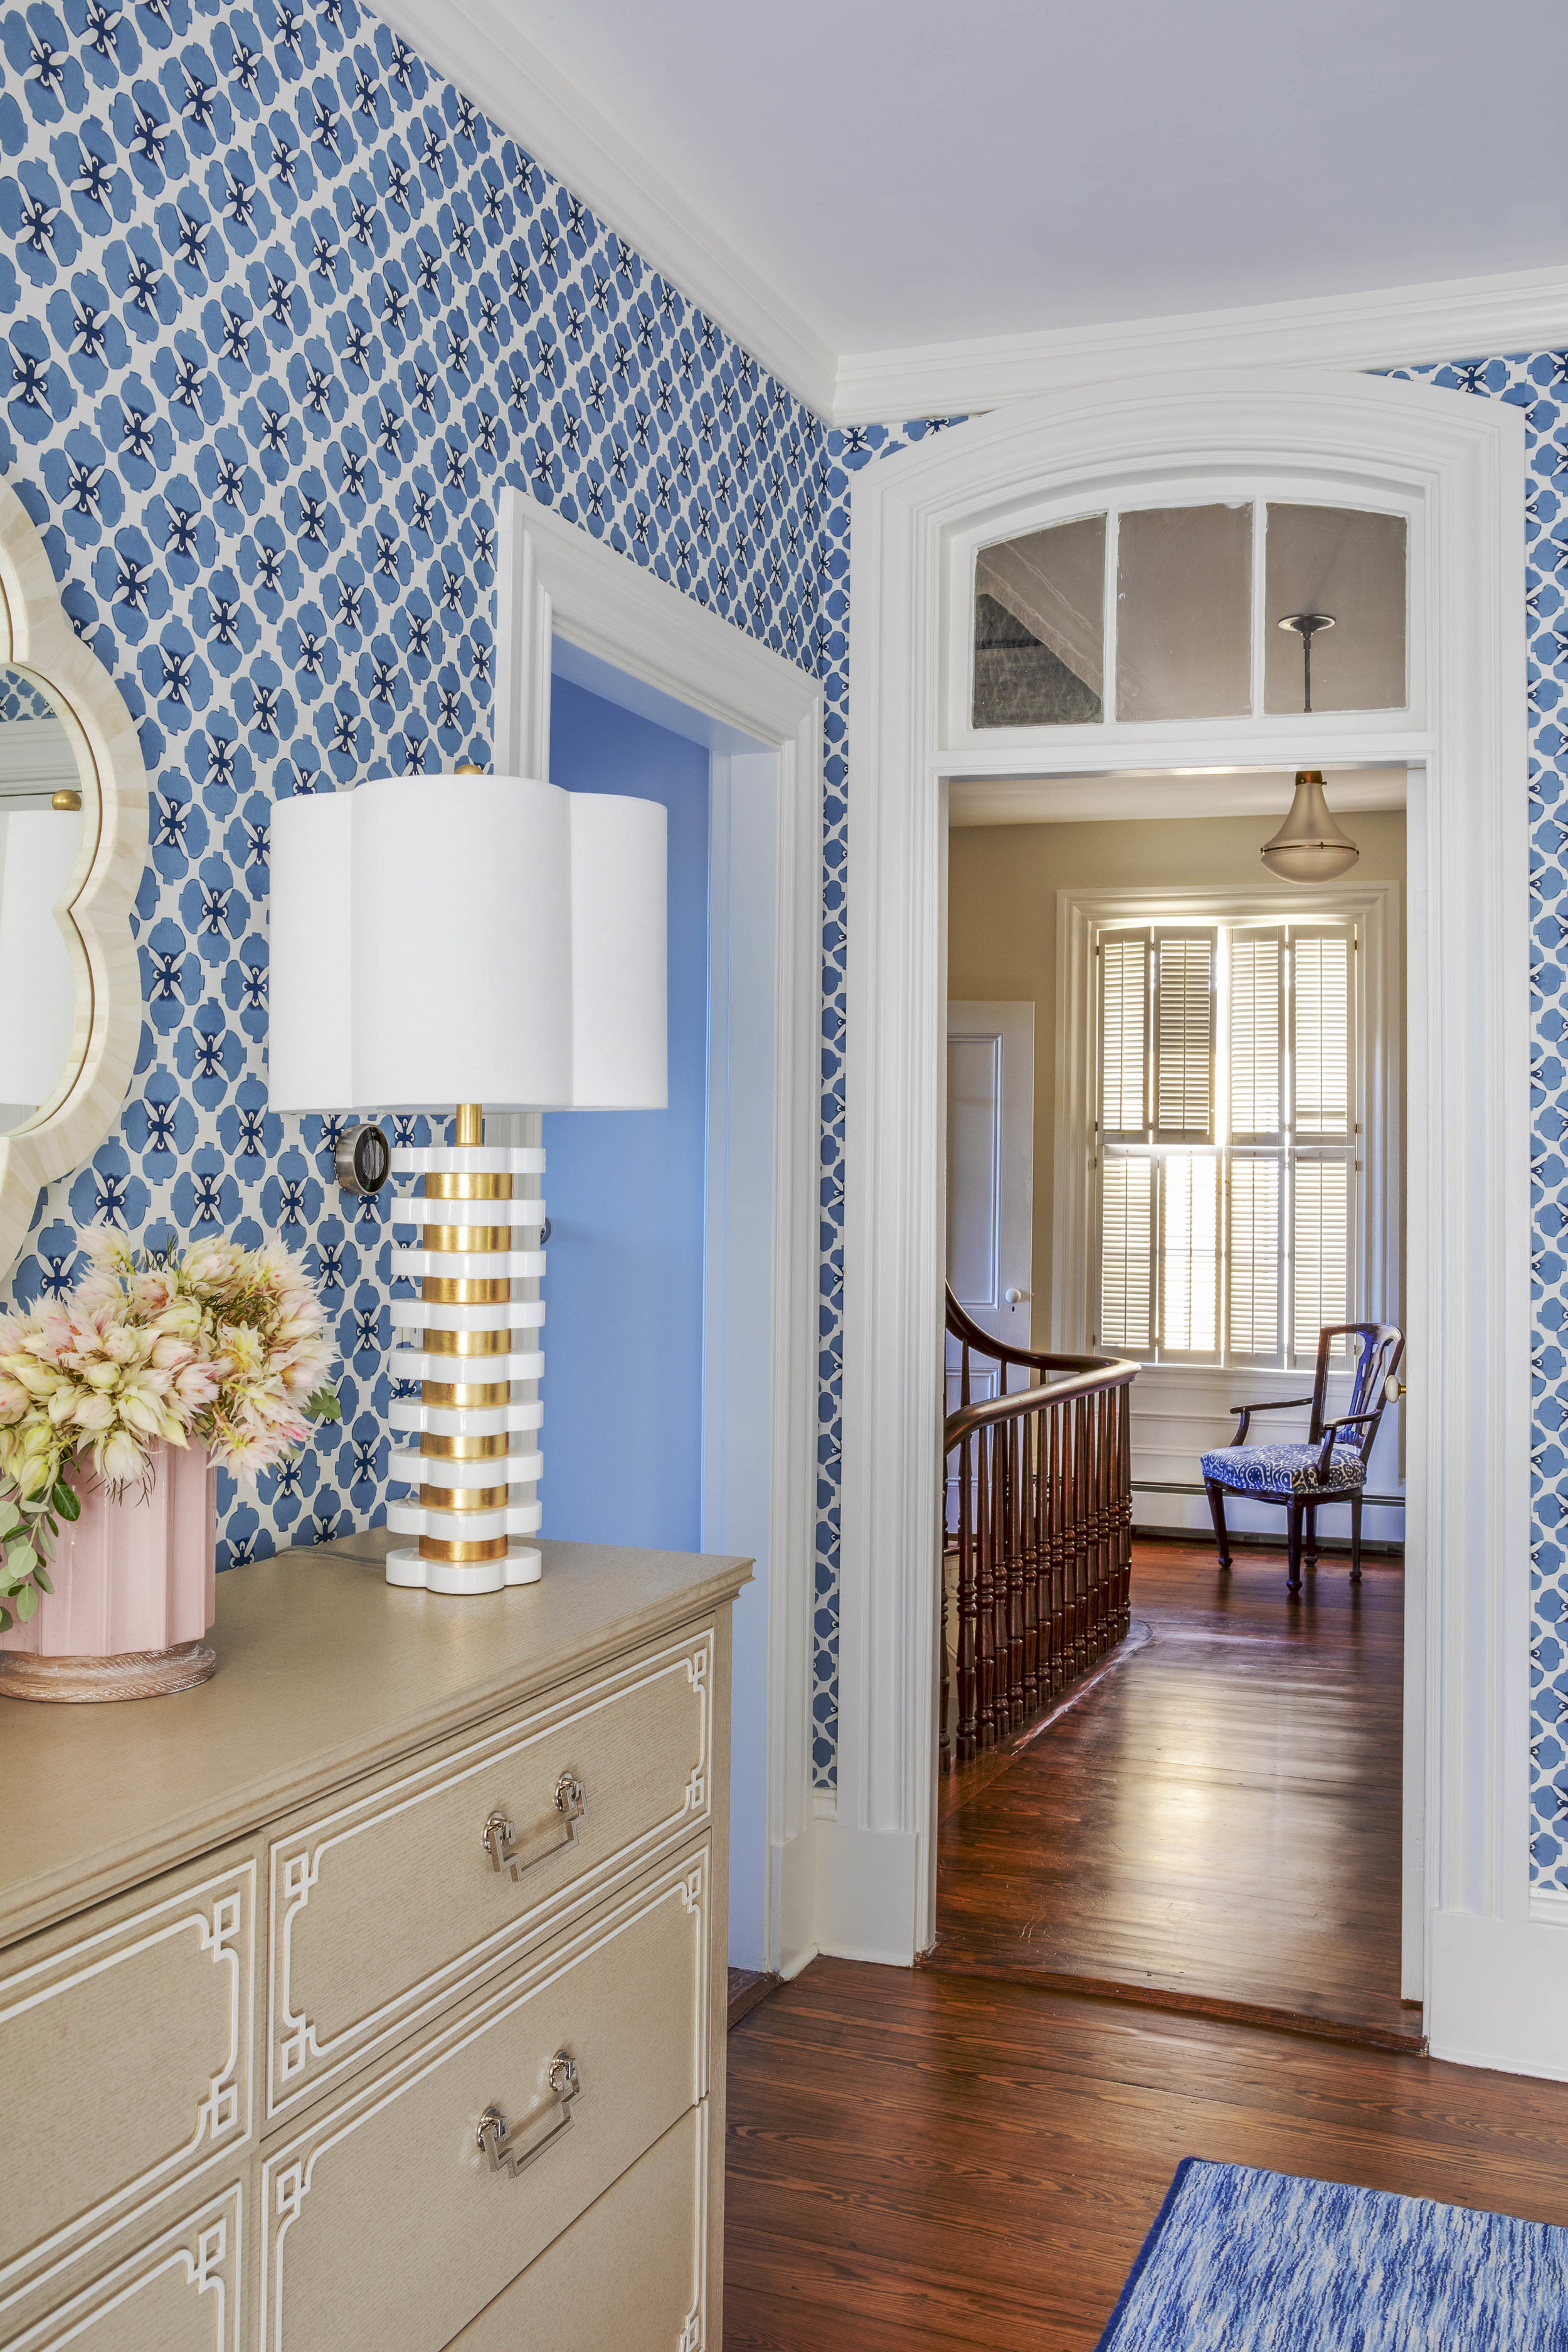 Digs Design, Digs, Digs Design Company, Interior Design, Jocelyn Chiappone, Rhode Island, Newport, Providence, Benefit Street, Master bedroom, bedroom